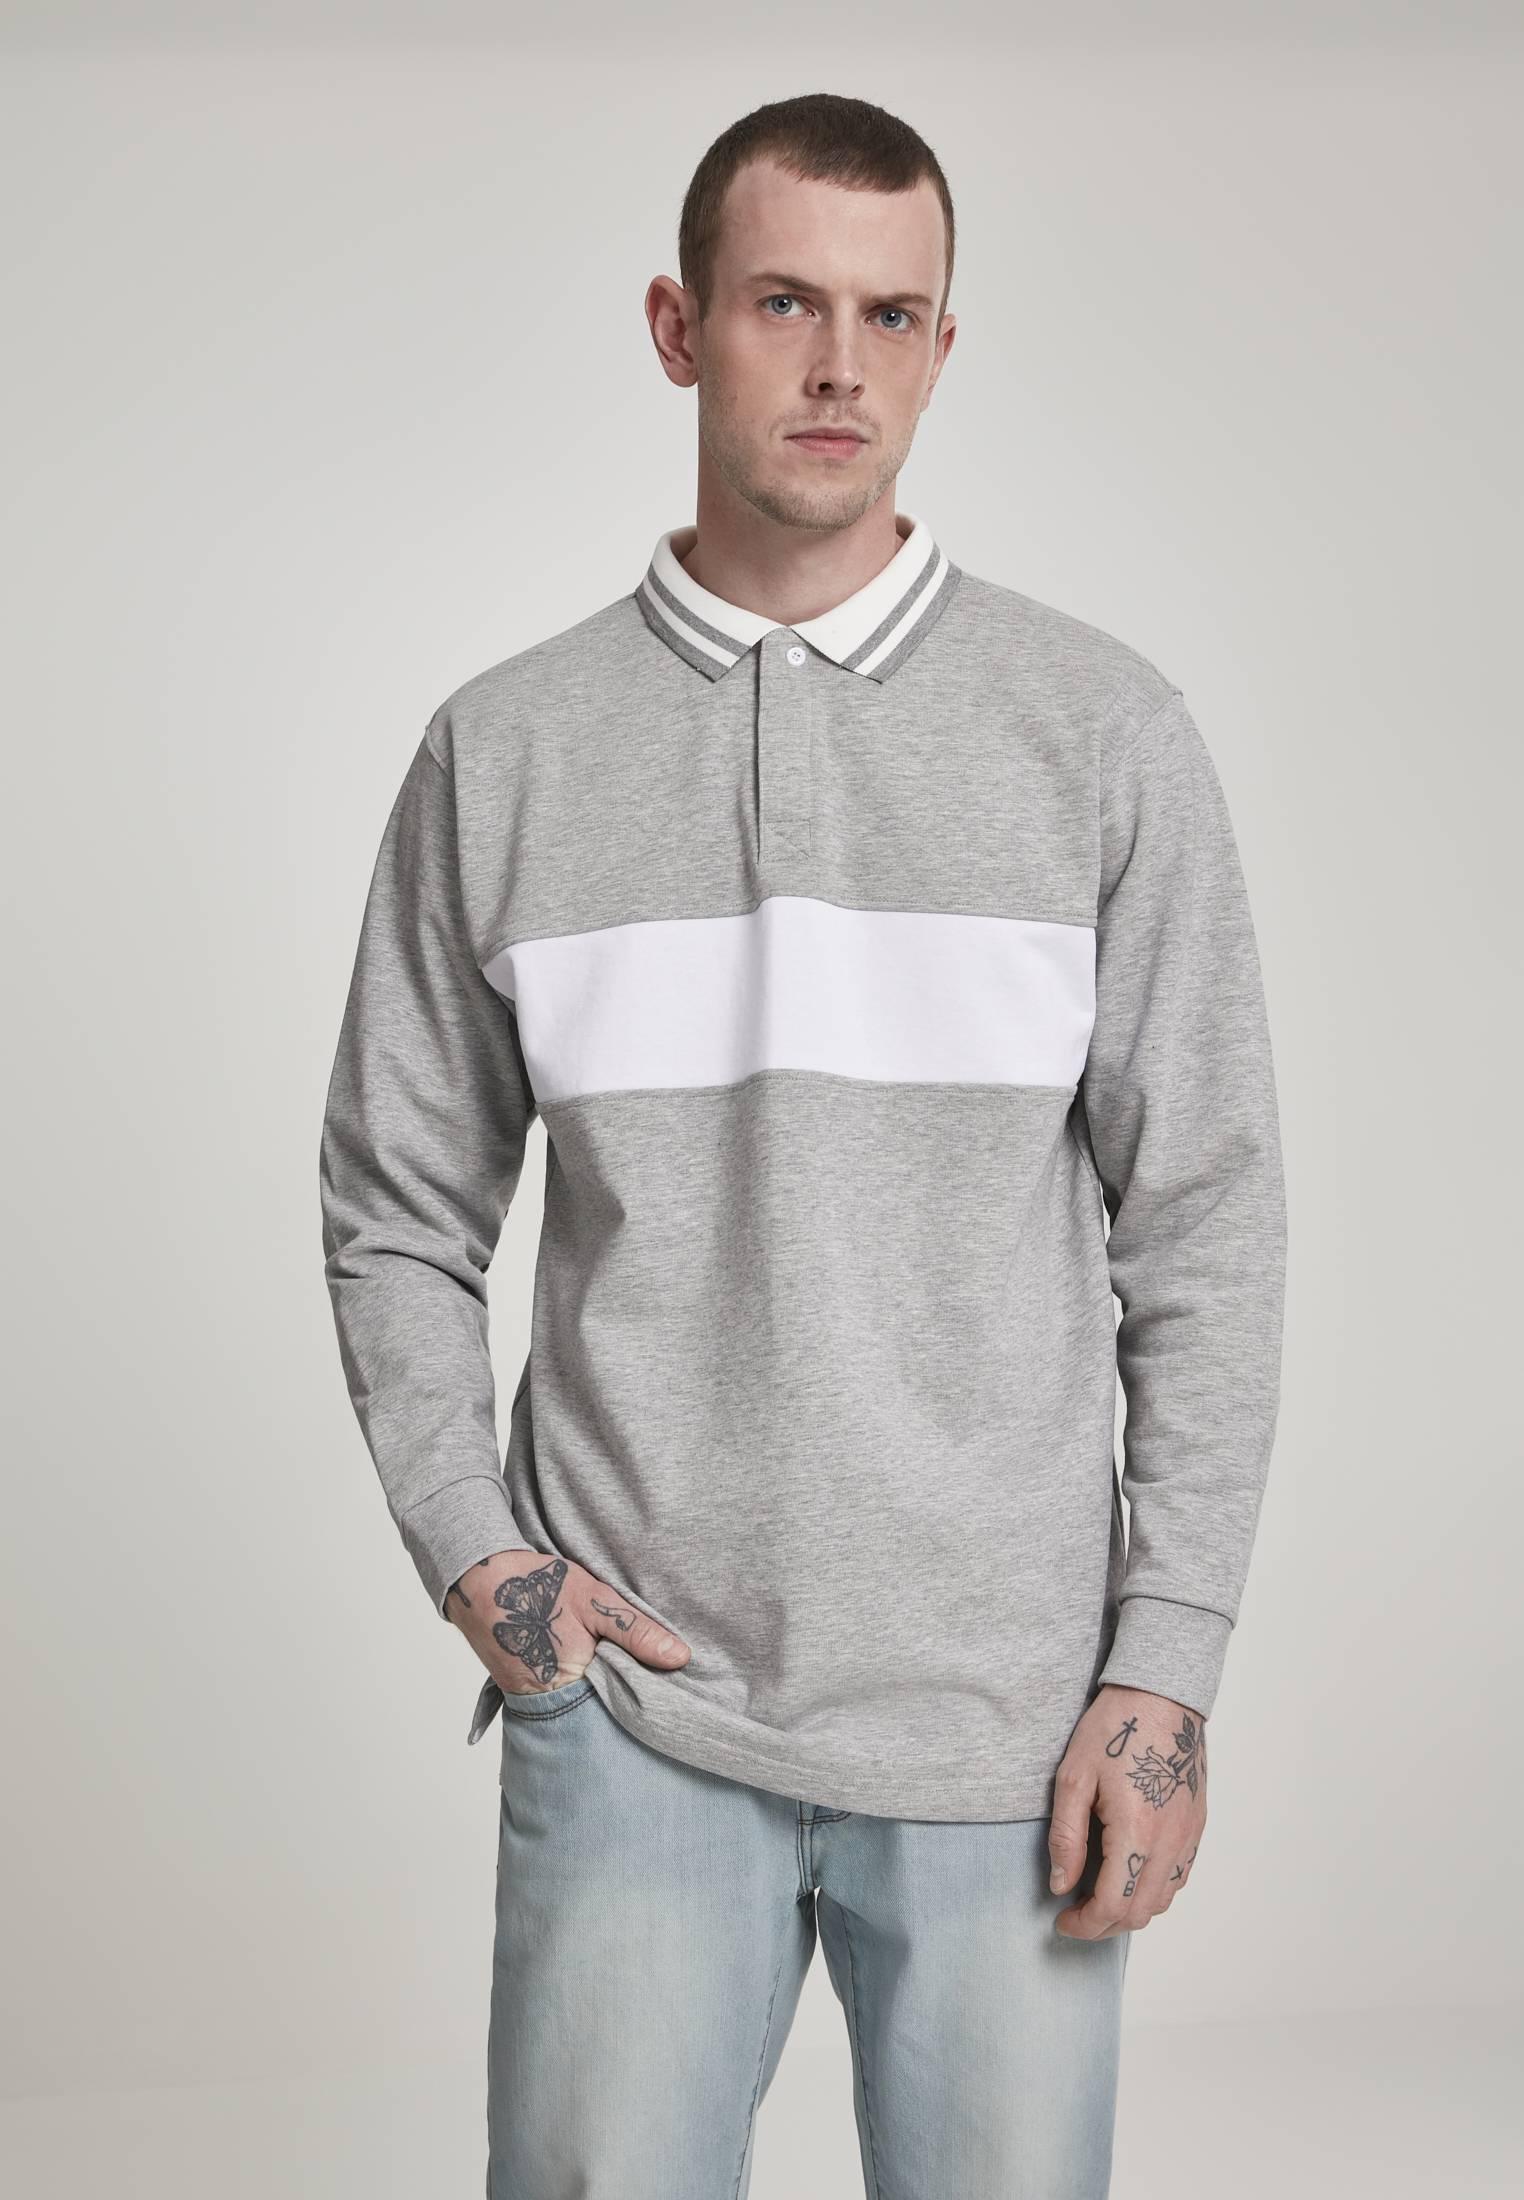 Urban Classics Rugby Panel Shirt grey/white - L